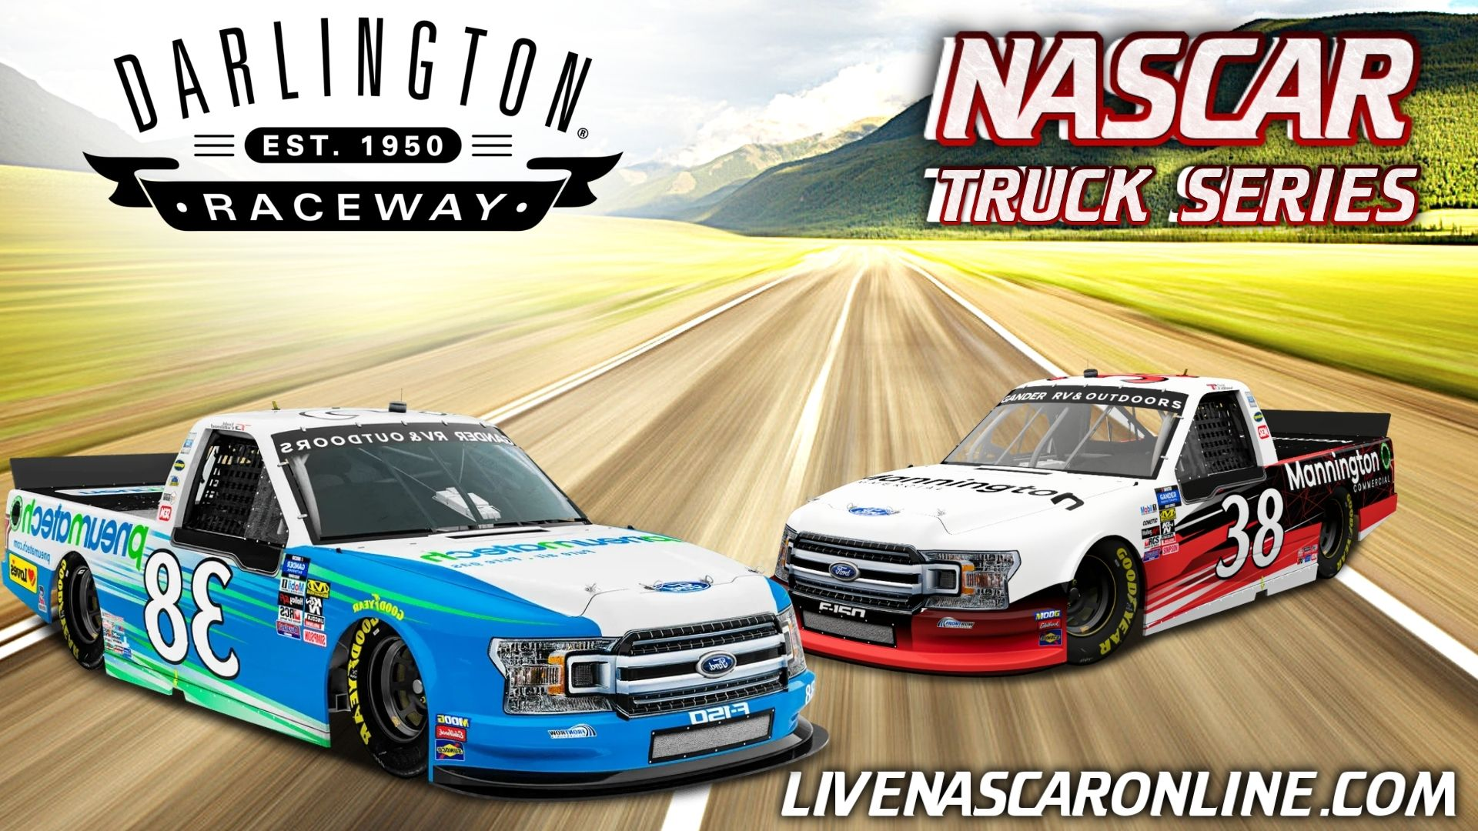 NASCAR Truck at Darlington Live Stream